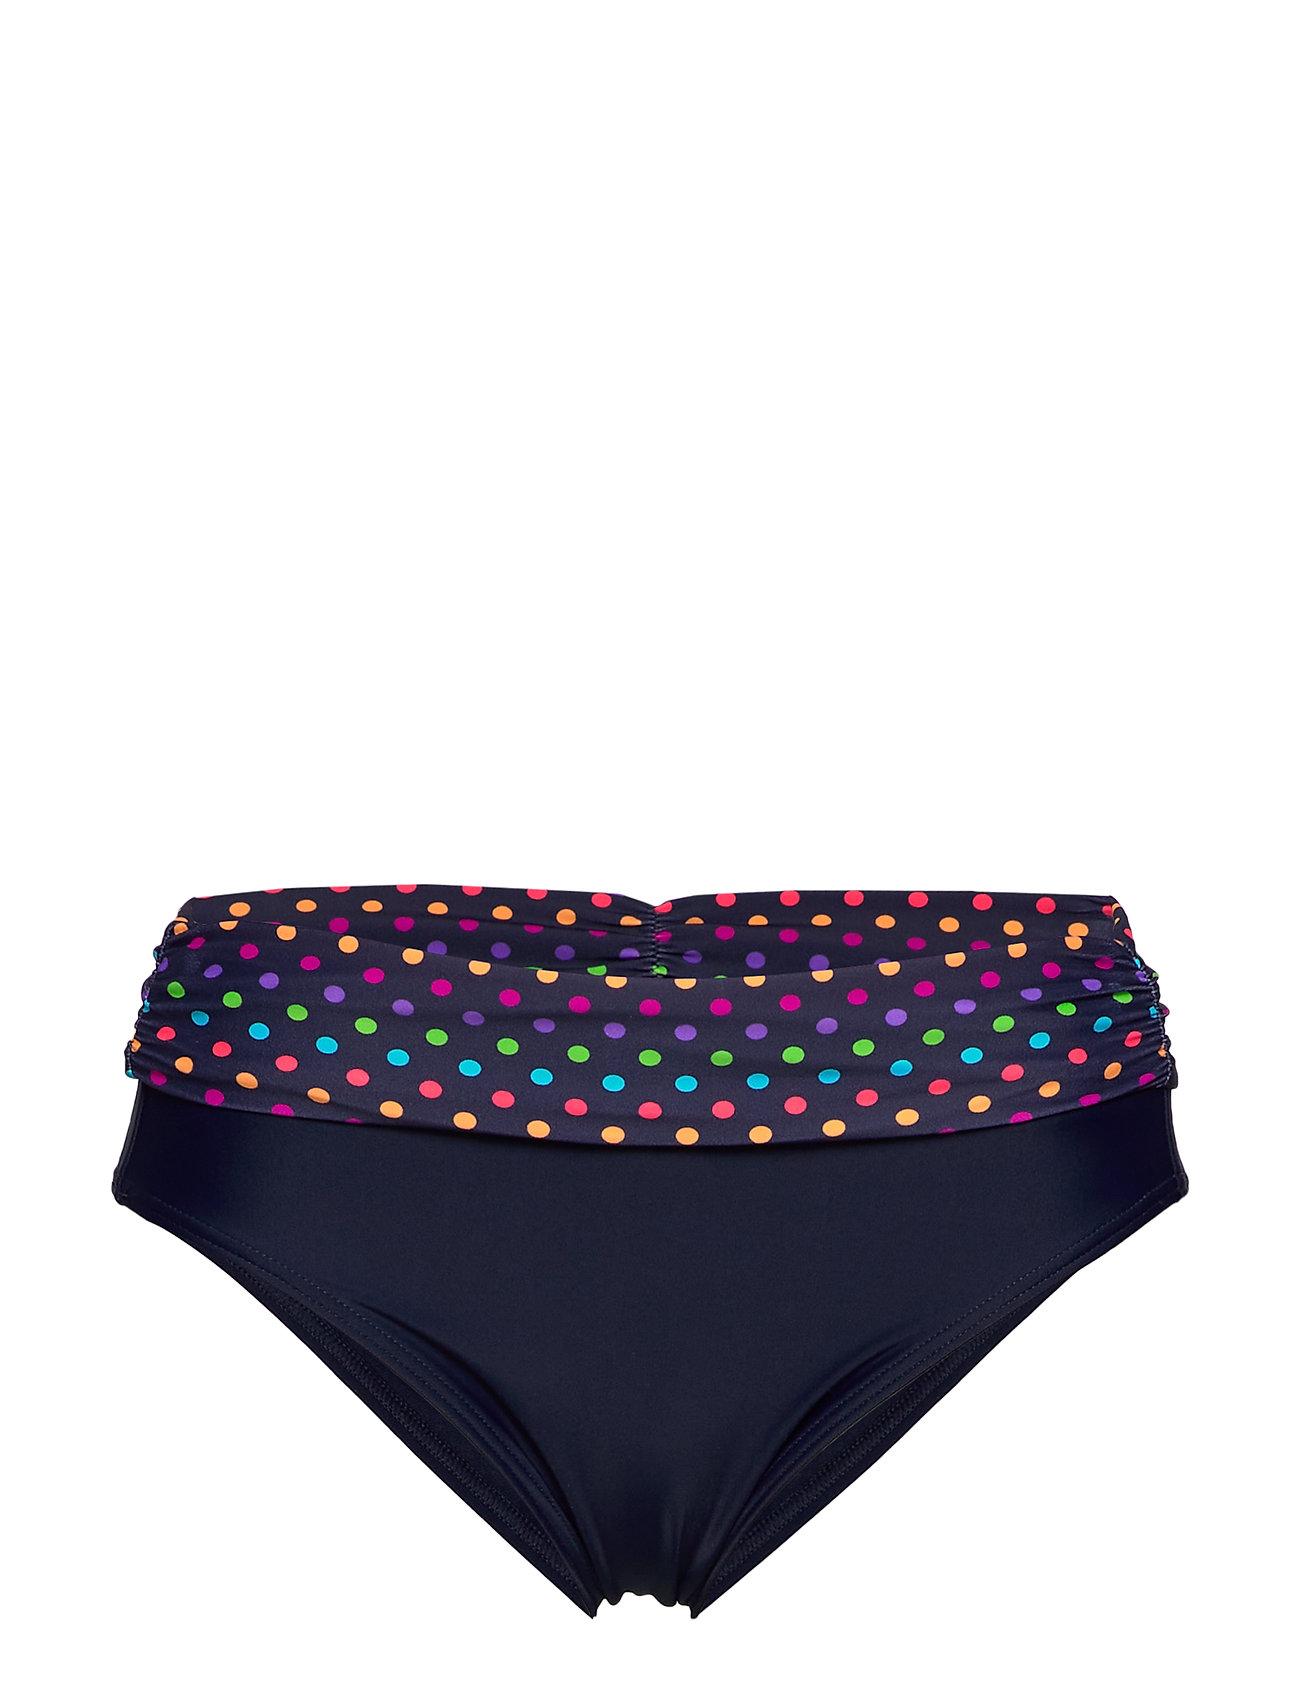 Image of Swim Tai De Luxe Bikinitrusser Blå Wiki (3368408083)